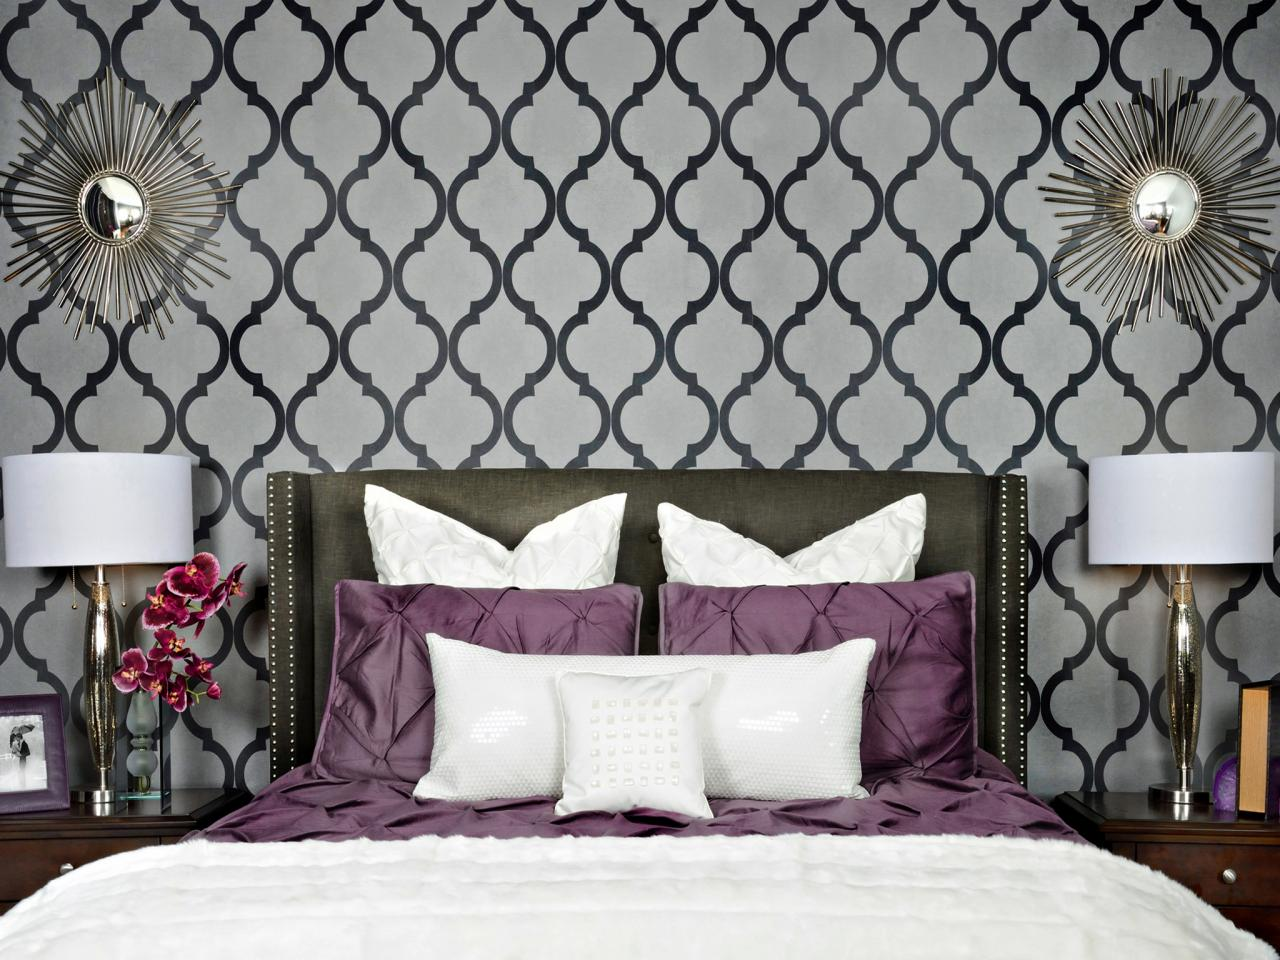 38+ Grey and Purple Wallpaper on WallpaperSafari